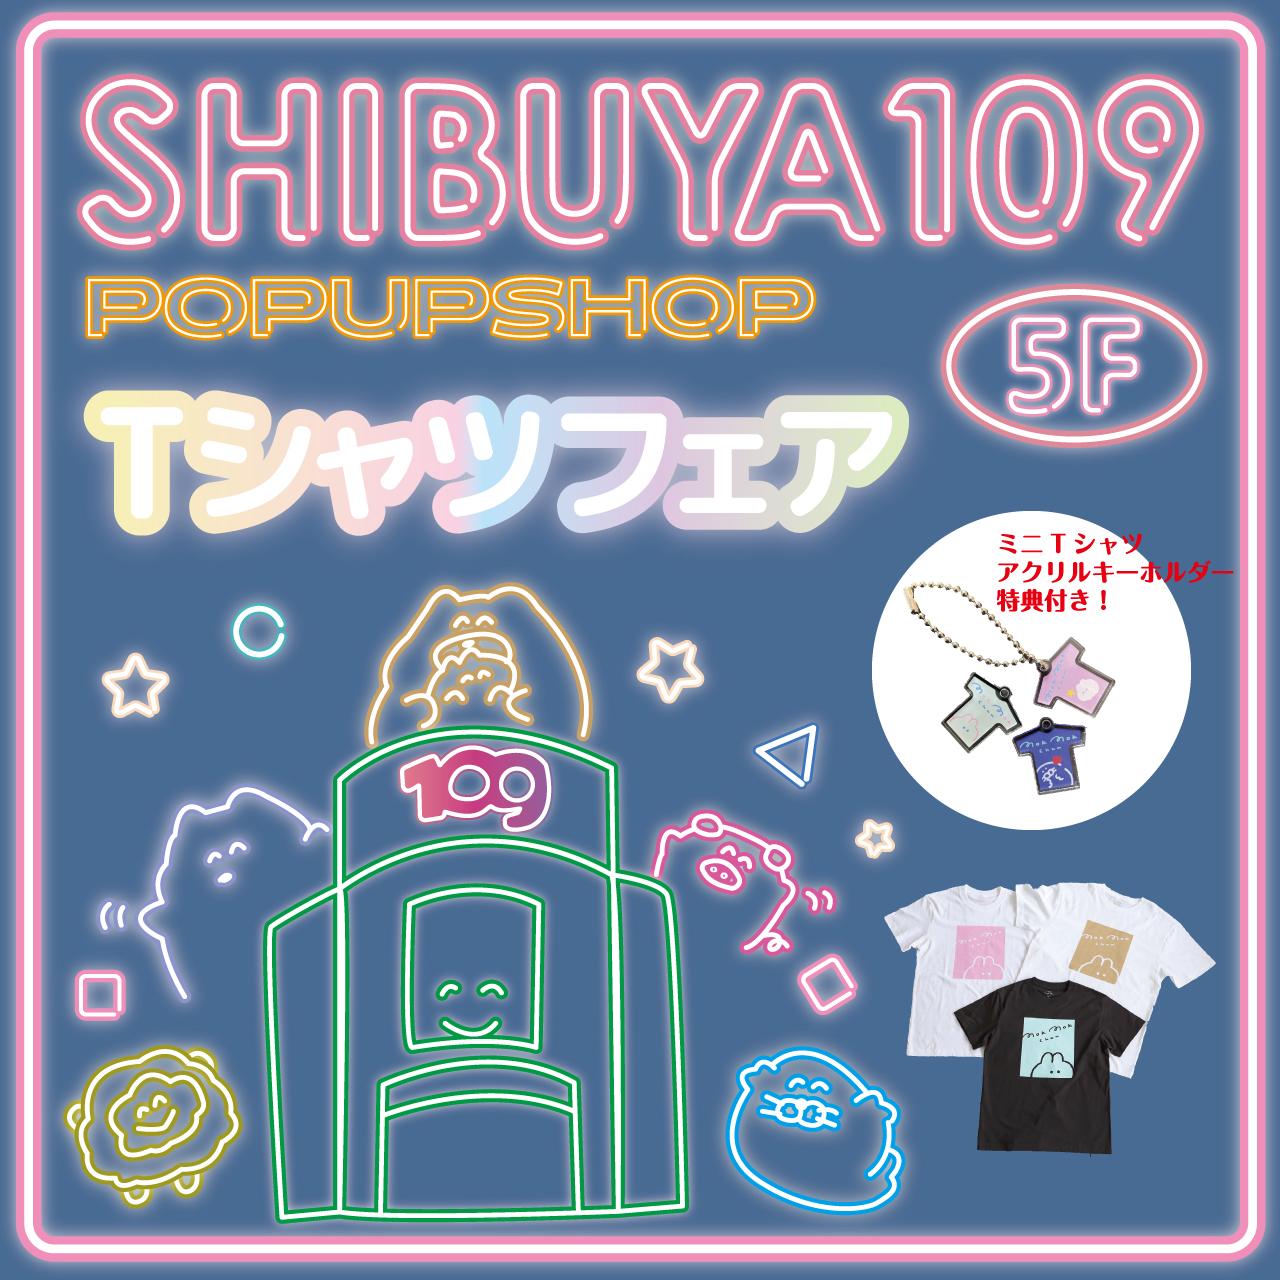 《SHIBUYA109》もくもくちゃんオフィシャルPOPUP Tシャツフェア開催!